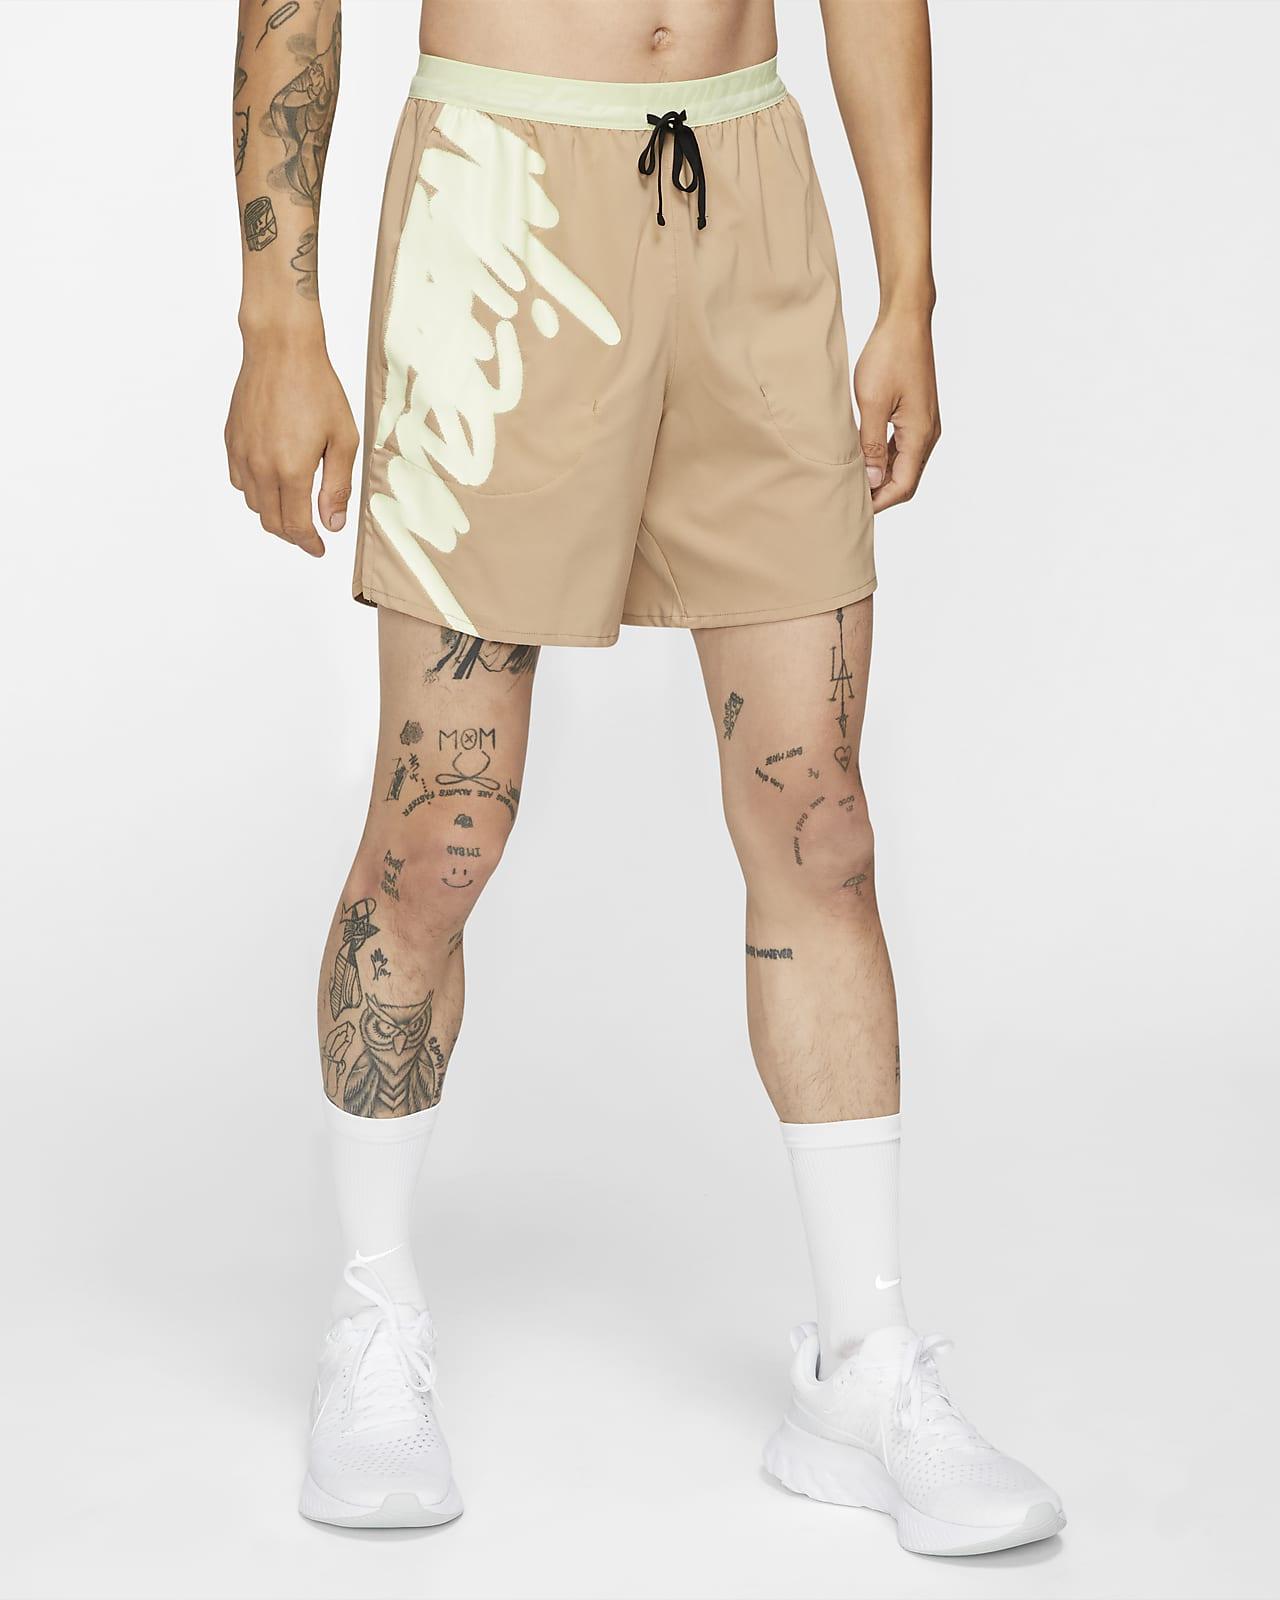 Nike Dri-FIT Flex Stride Wild Run Men's Unlined 18cm (approx.) Running Shorts